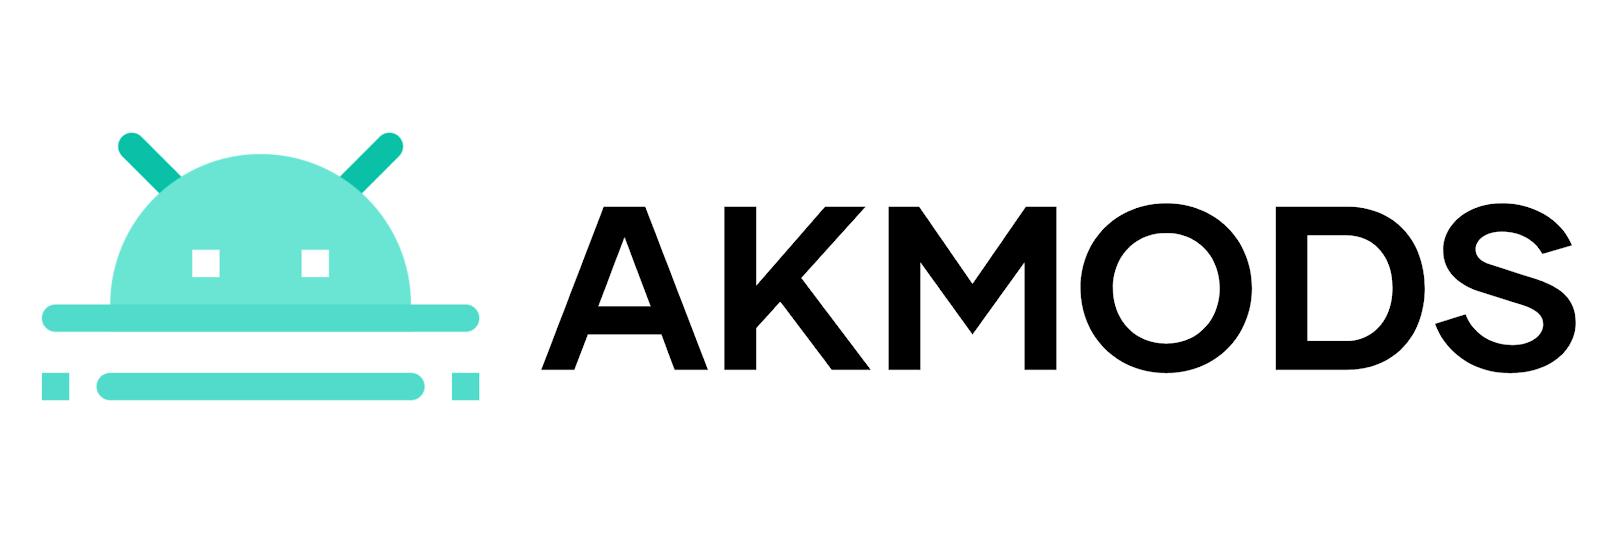 AKMODS